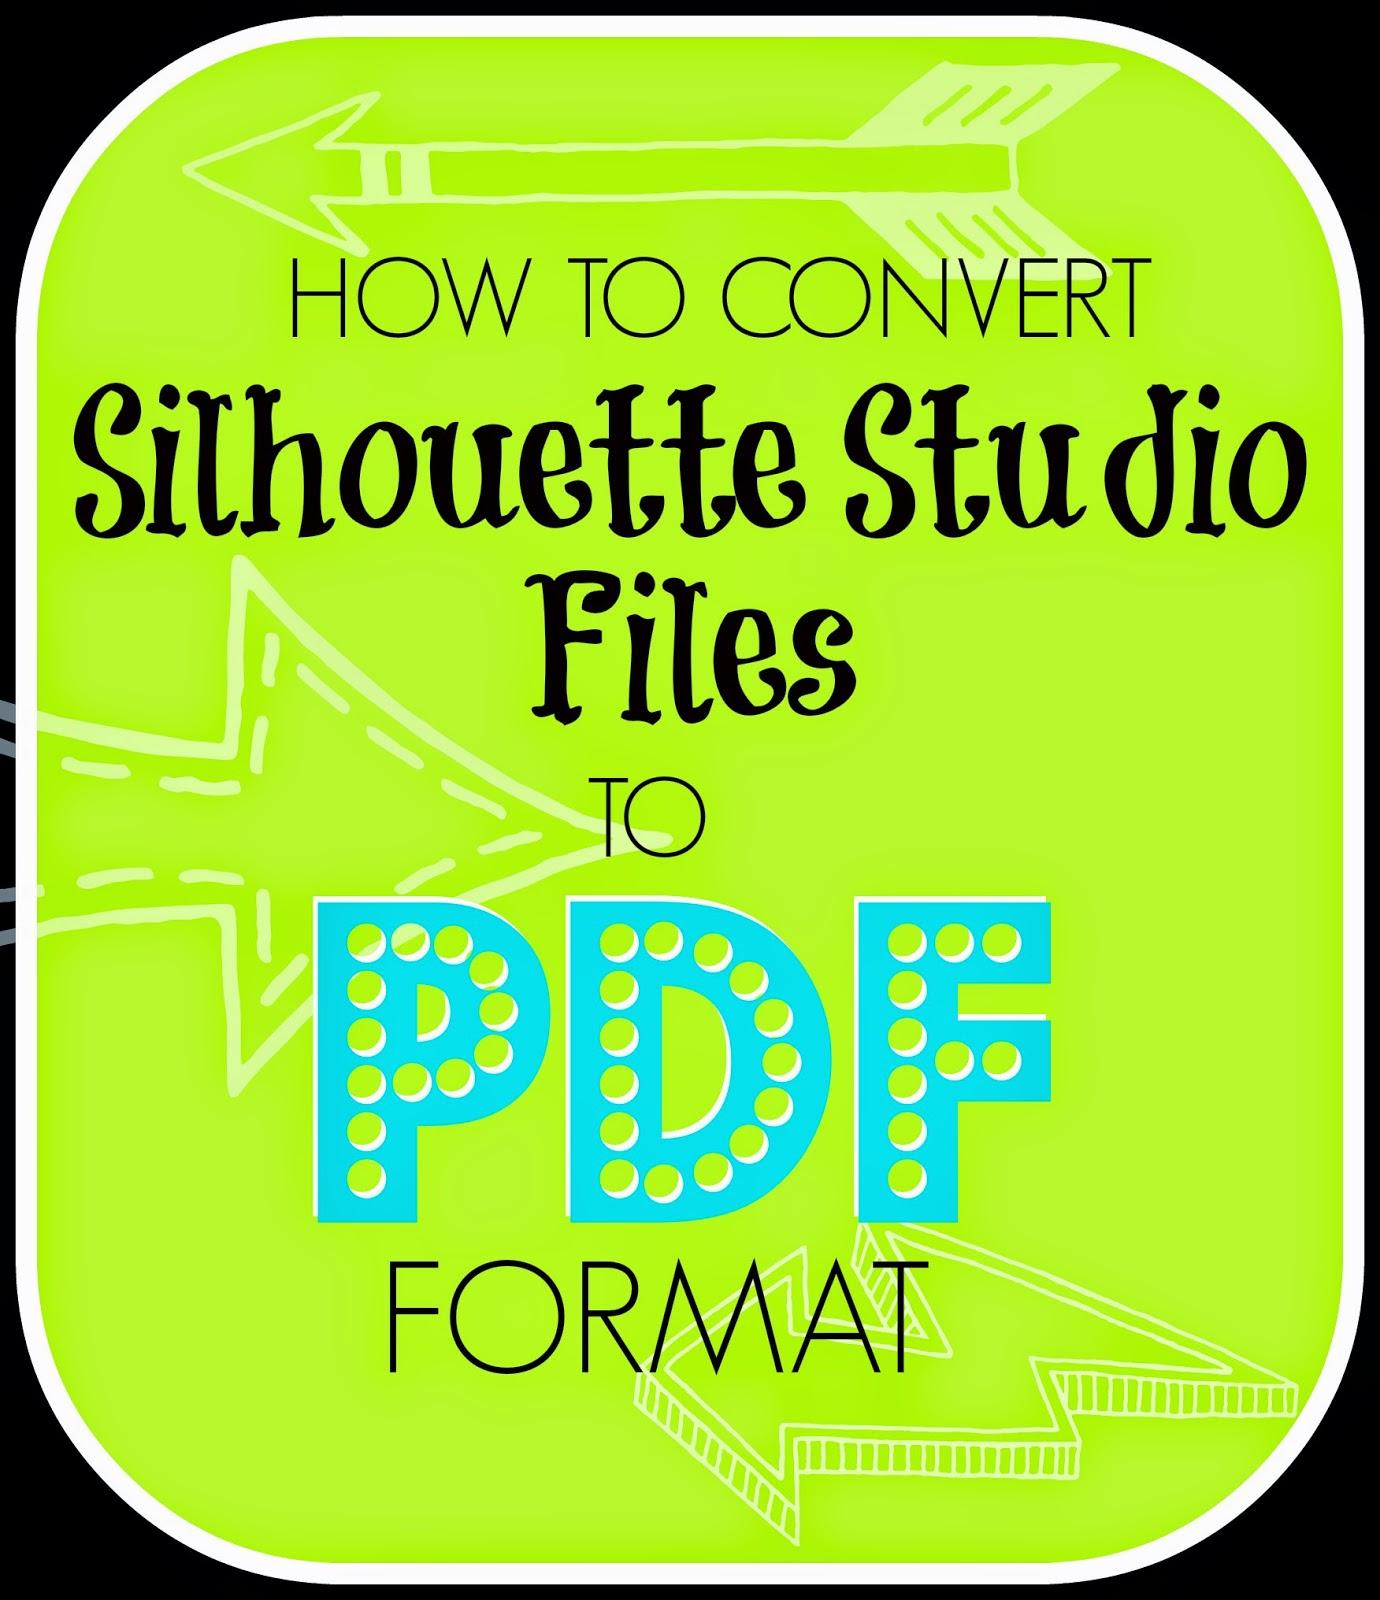 Silhouette Studio, Files, Pdf, Convert Take A Document Offline How To Edit